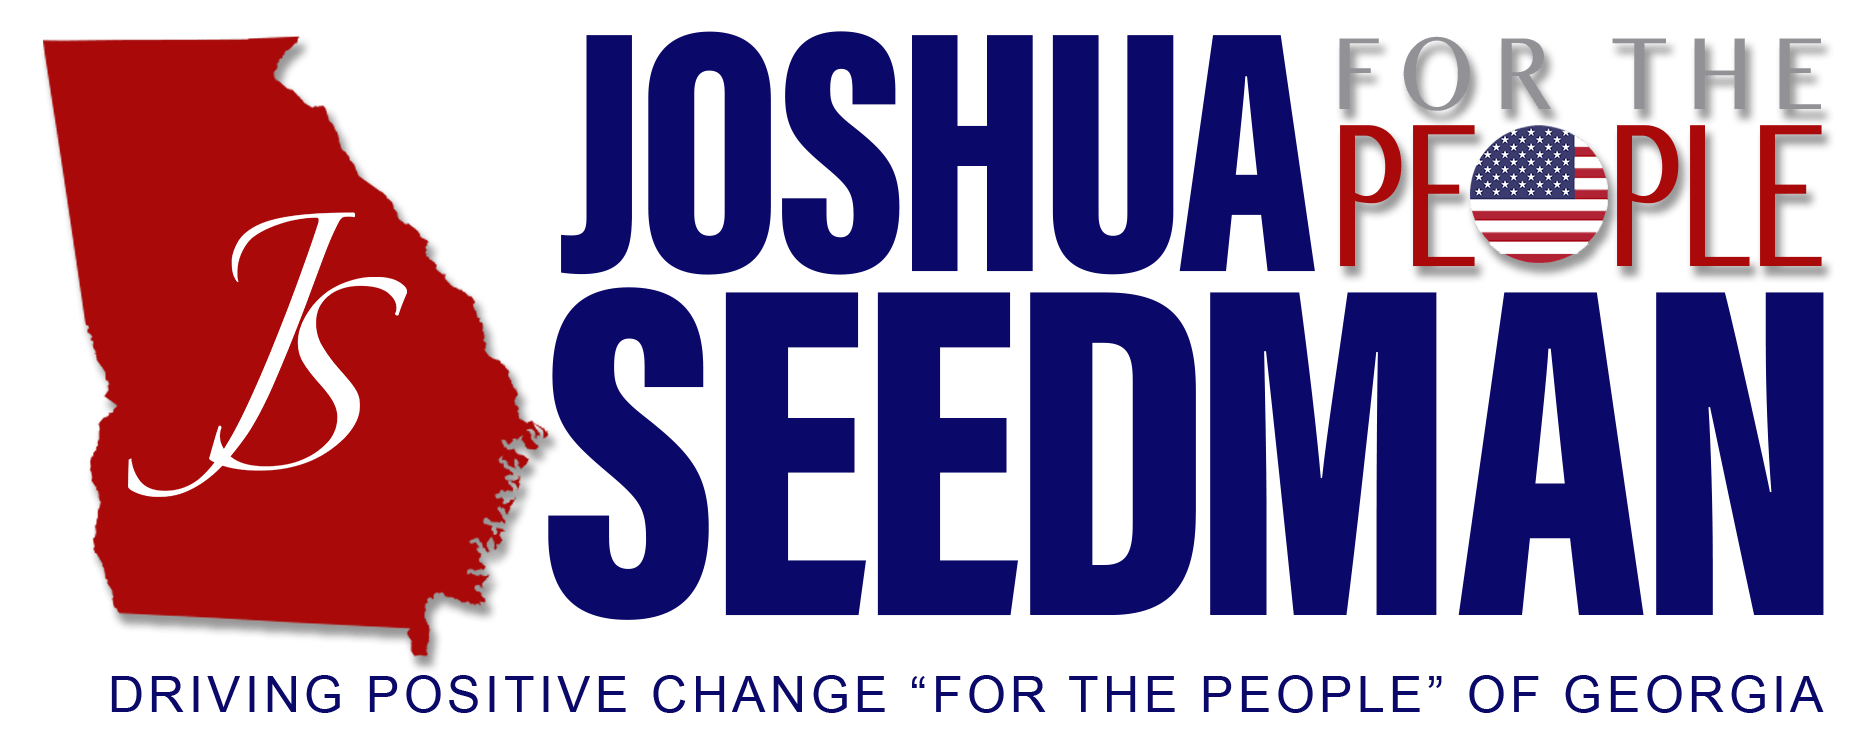 Joshua logo with text